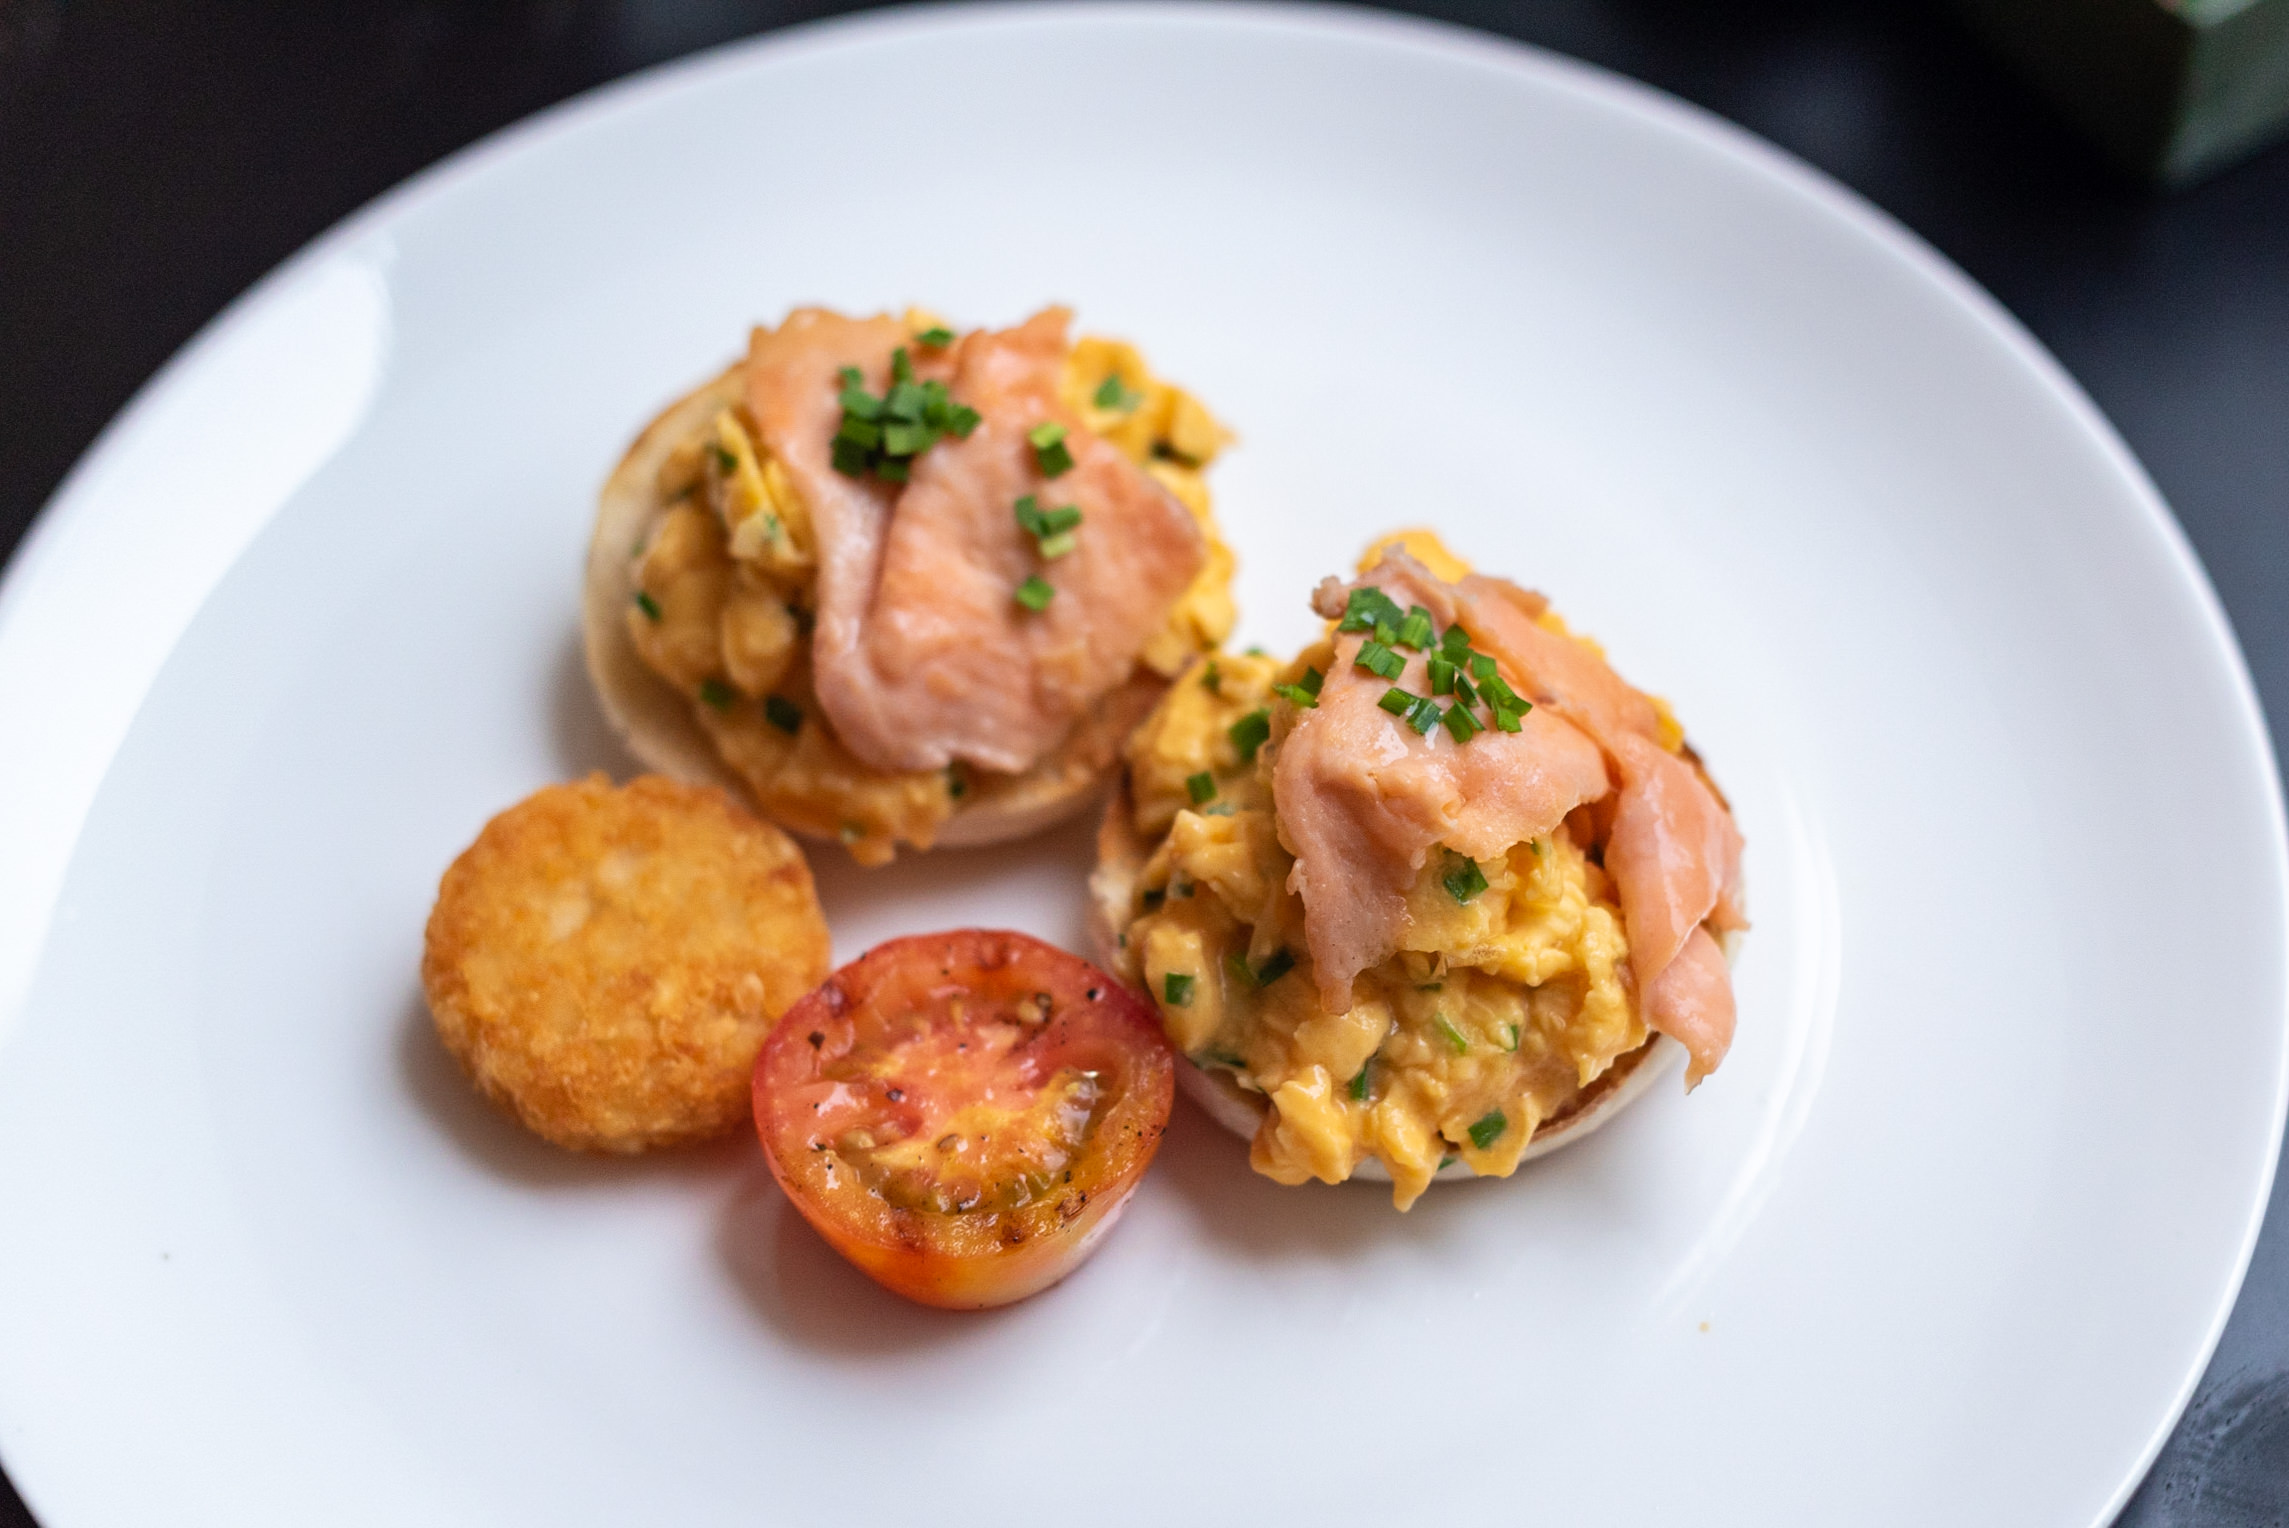 Truffle Scrambled Eggs - Breakfast  The Dining Room - Park Hyatt Siem Reap